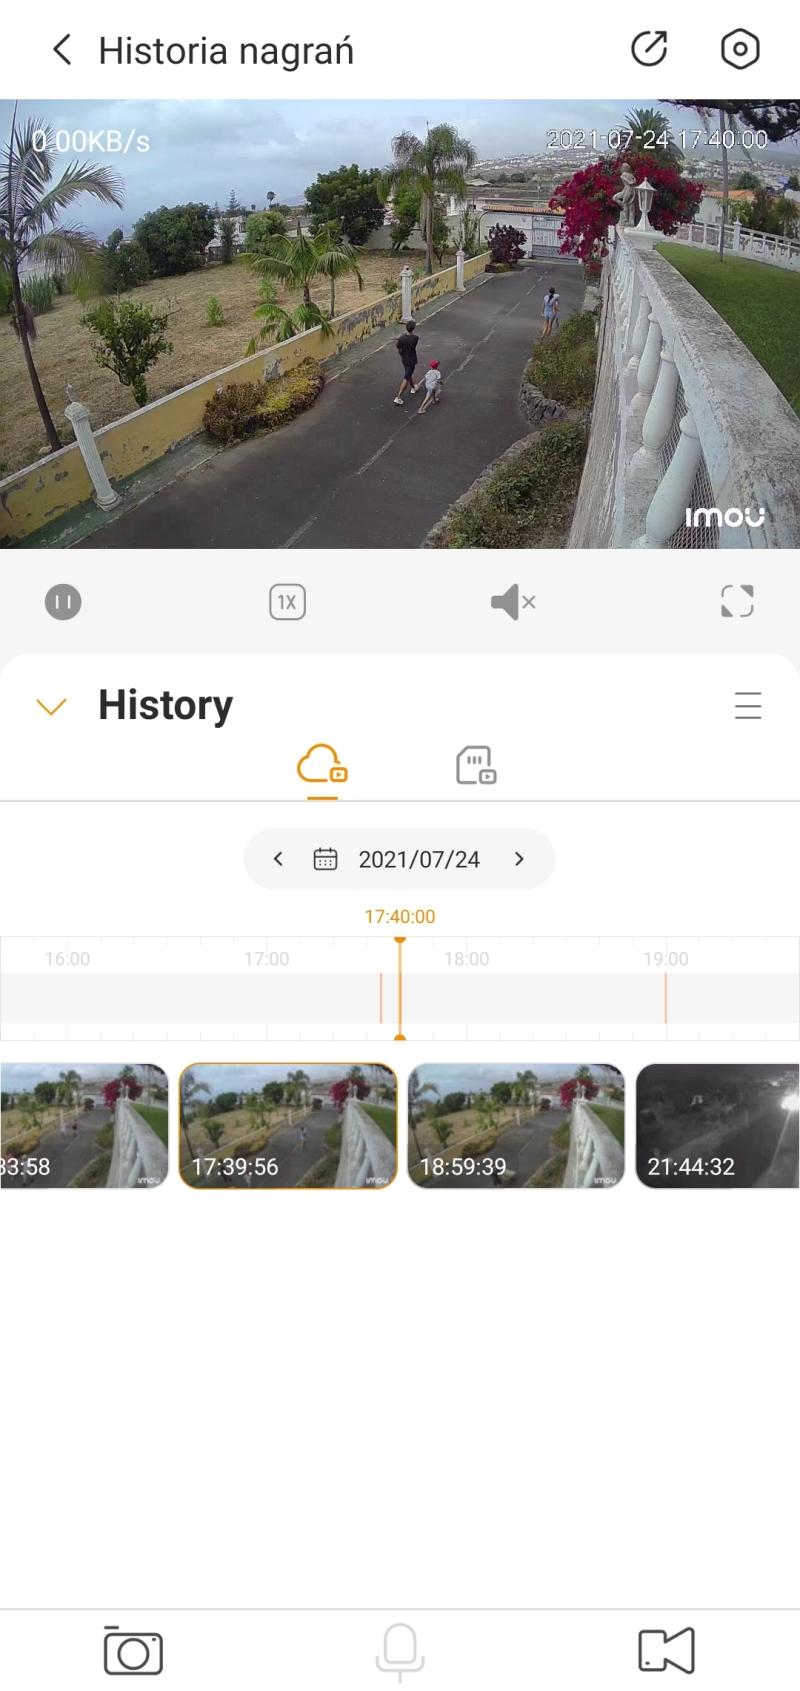 Recenzja Imou Bullet 2 - sensowna, bardzo tania kamera monitoringu domu